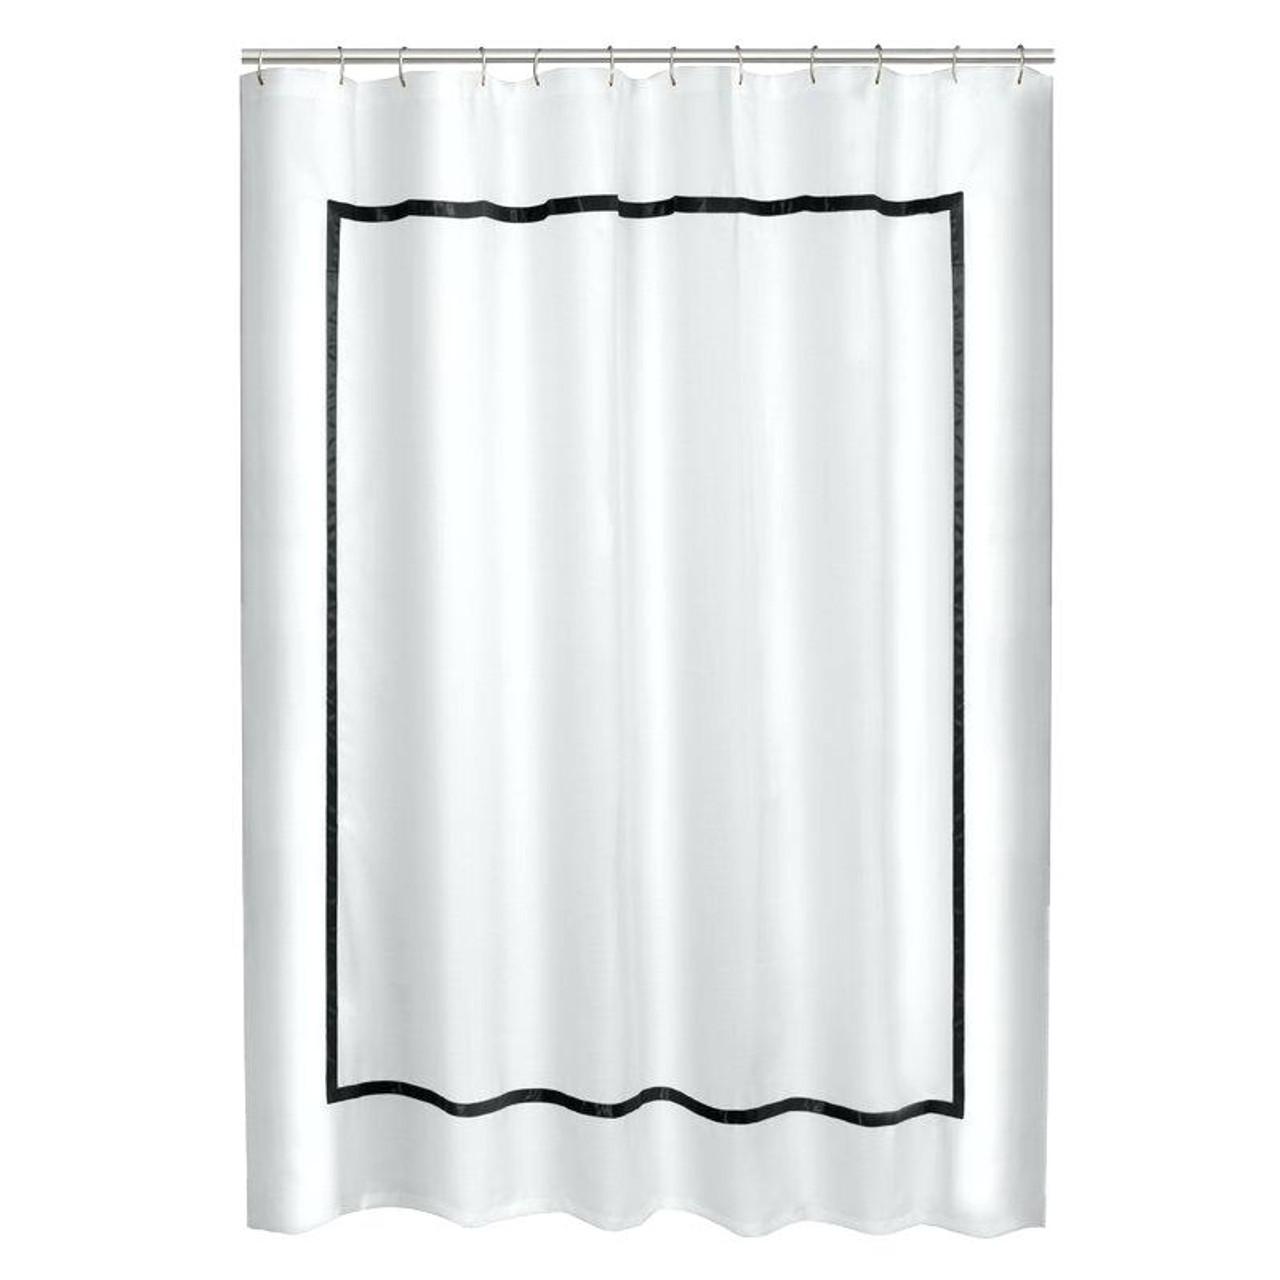 White Linen Shower Curtain With Border Trim Hotel Border Shower Curtain